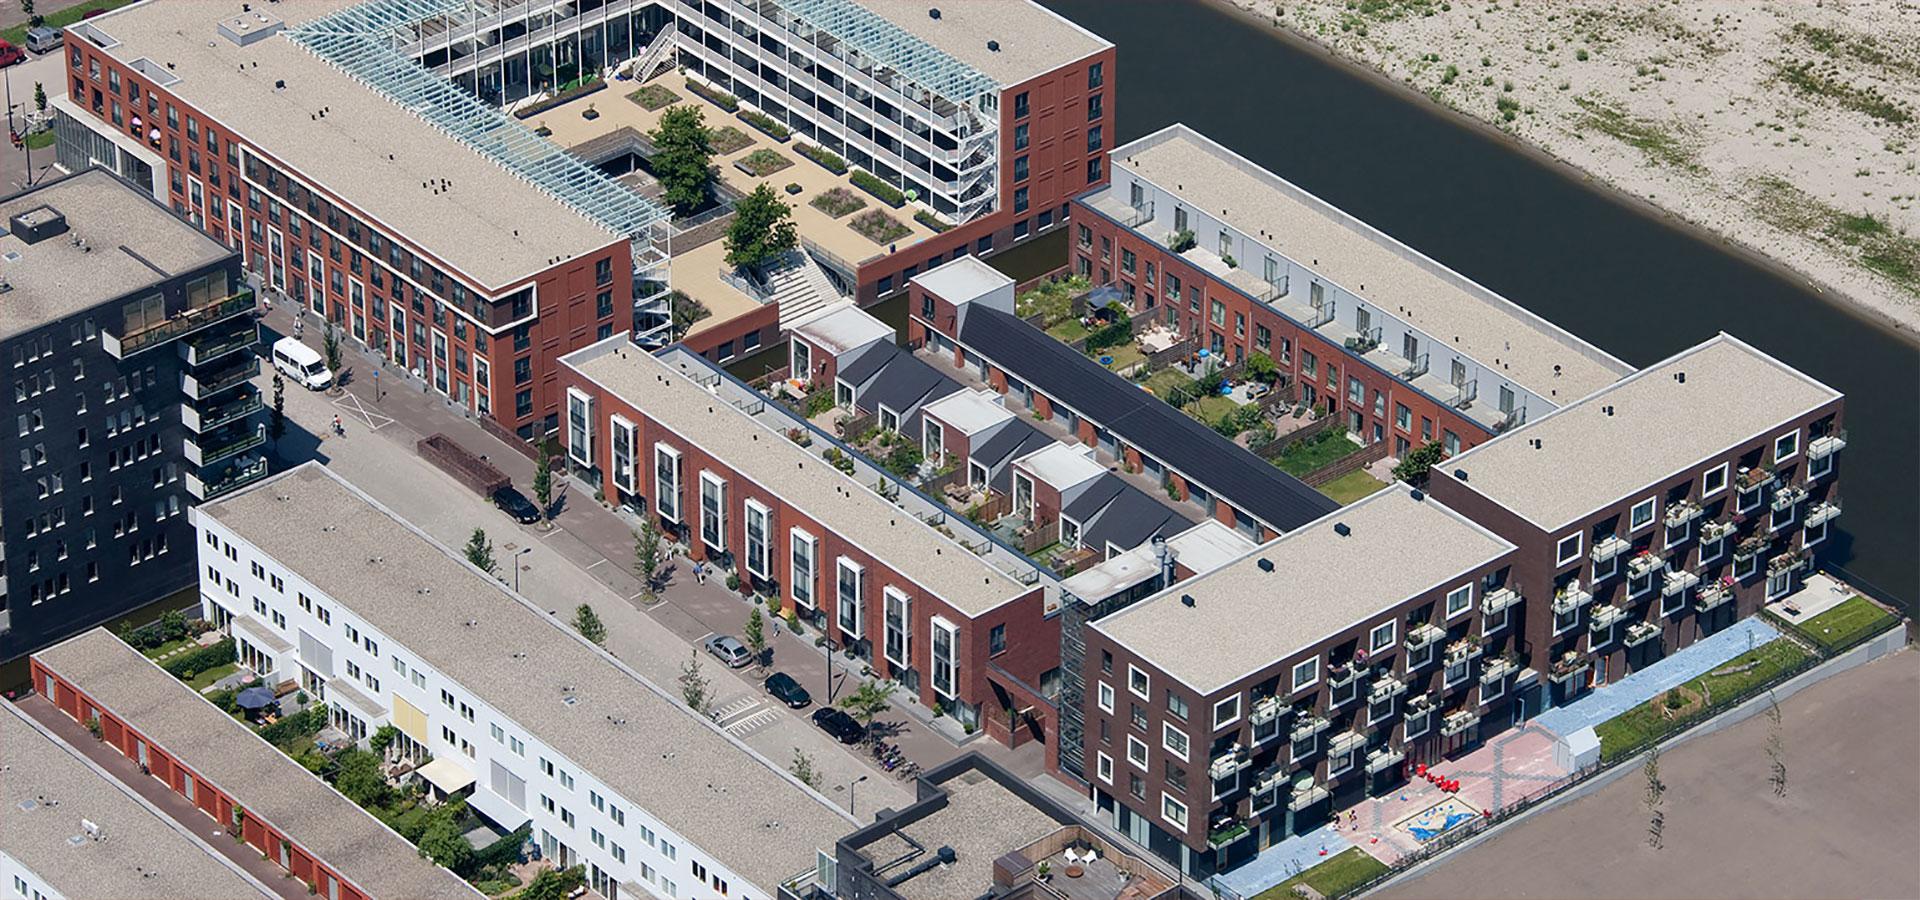 FARO-architecten-Haveneilend-IJburg-13.1